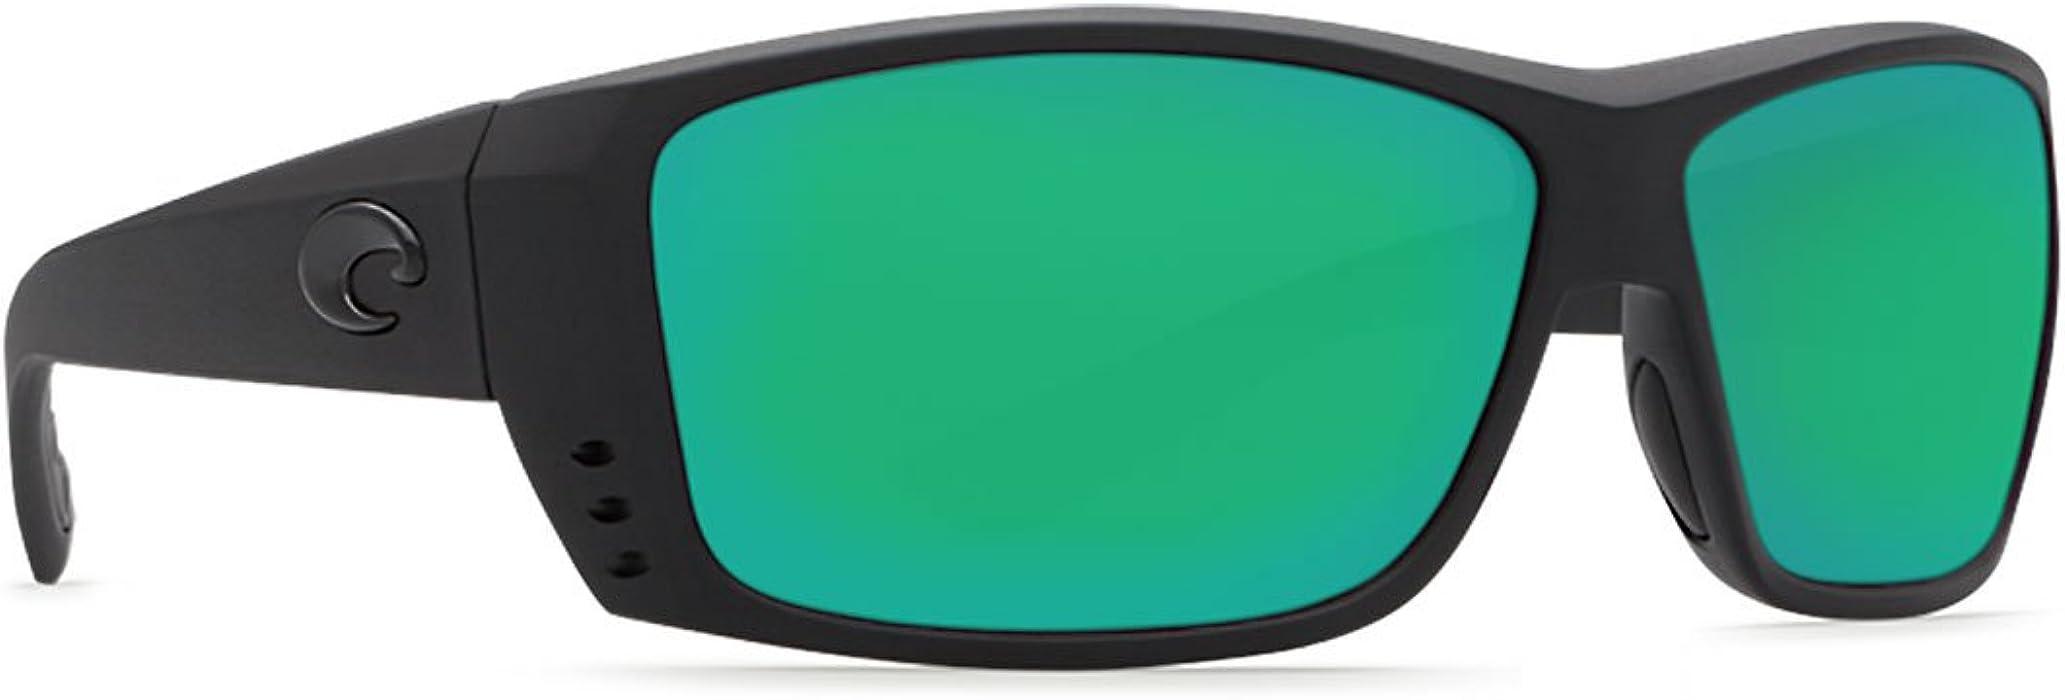 1d4c04c79cc Costa Del Mar Cat Cay 580G Polarized Sunglasses in Blackout   Green Mirror  Lens